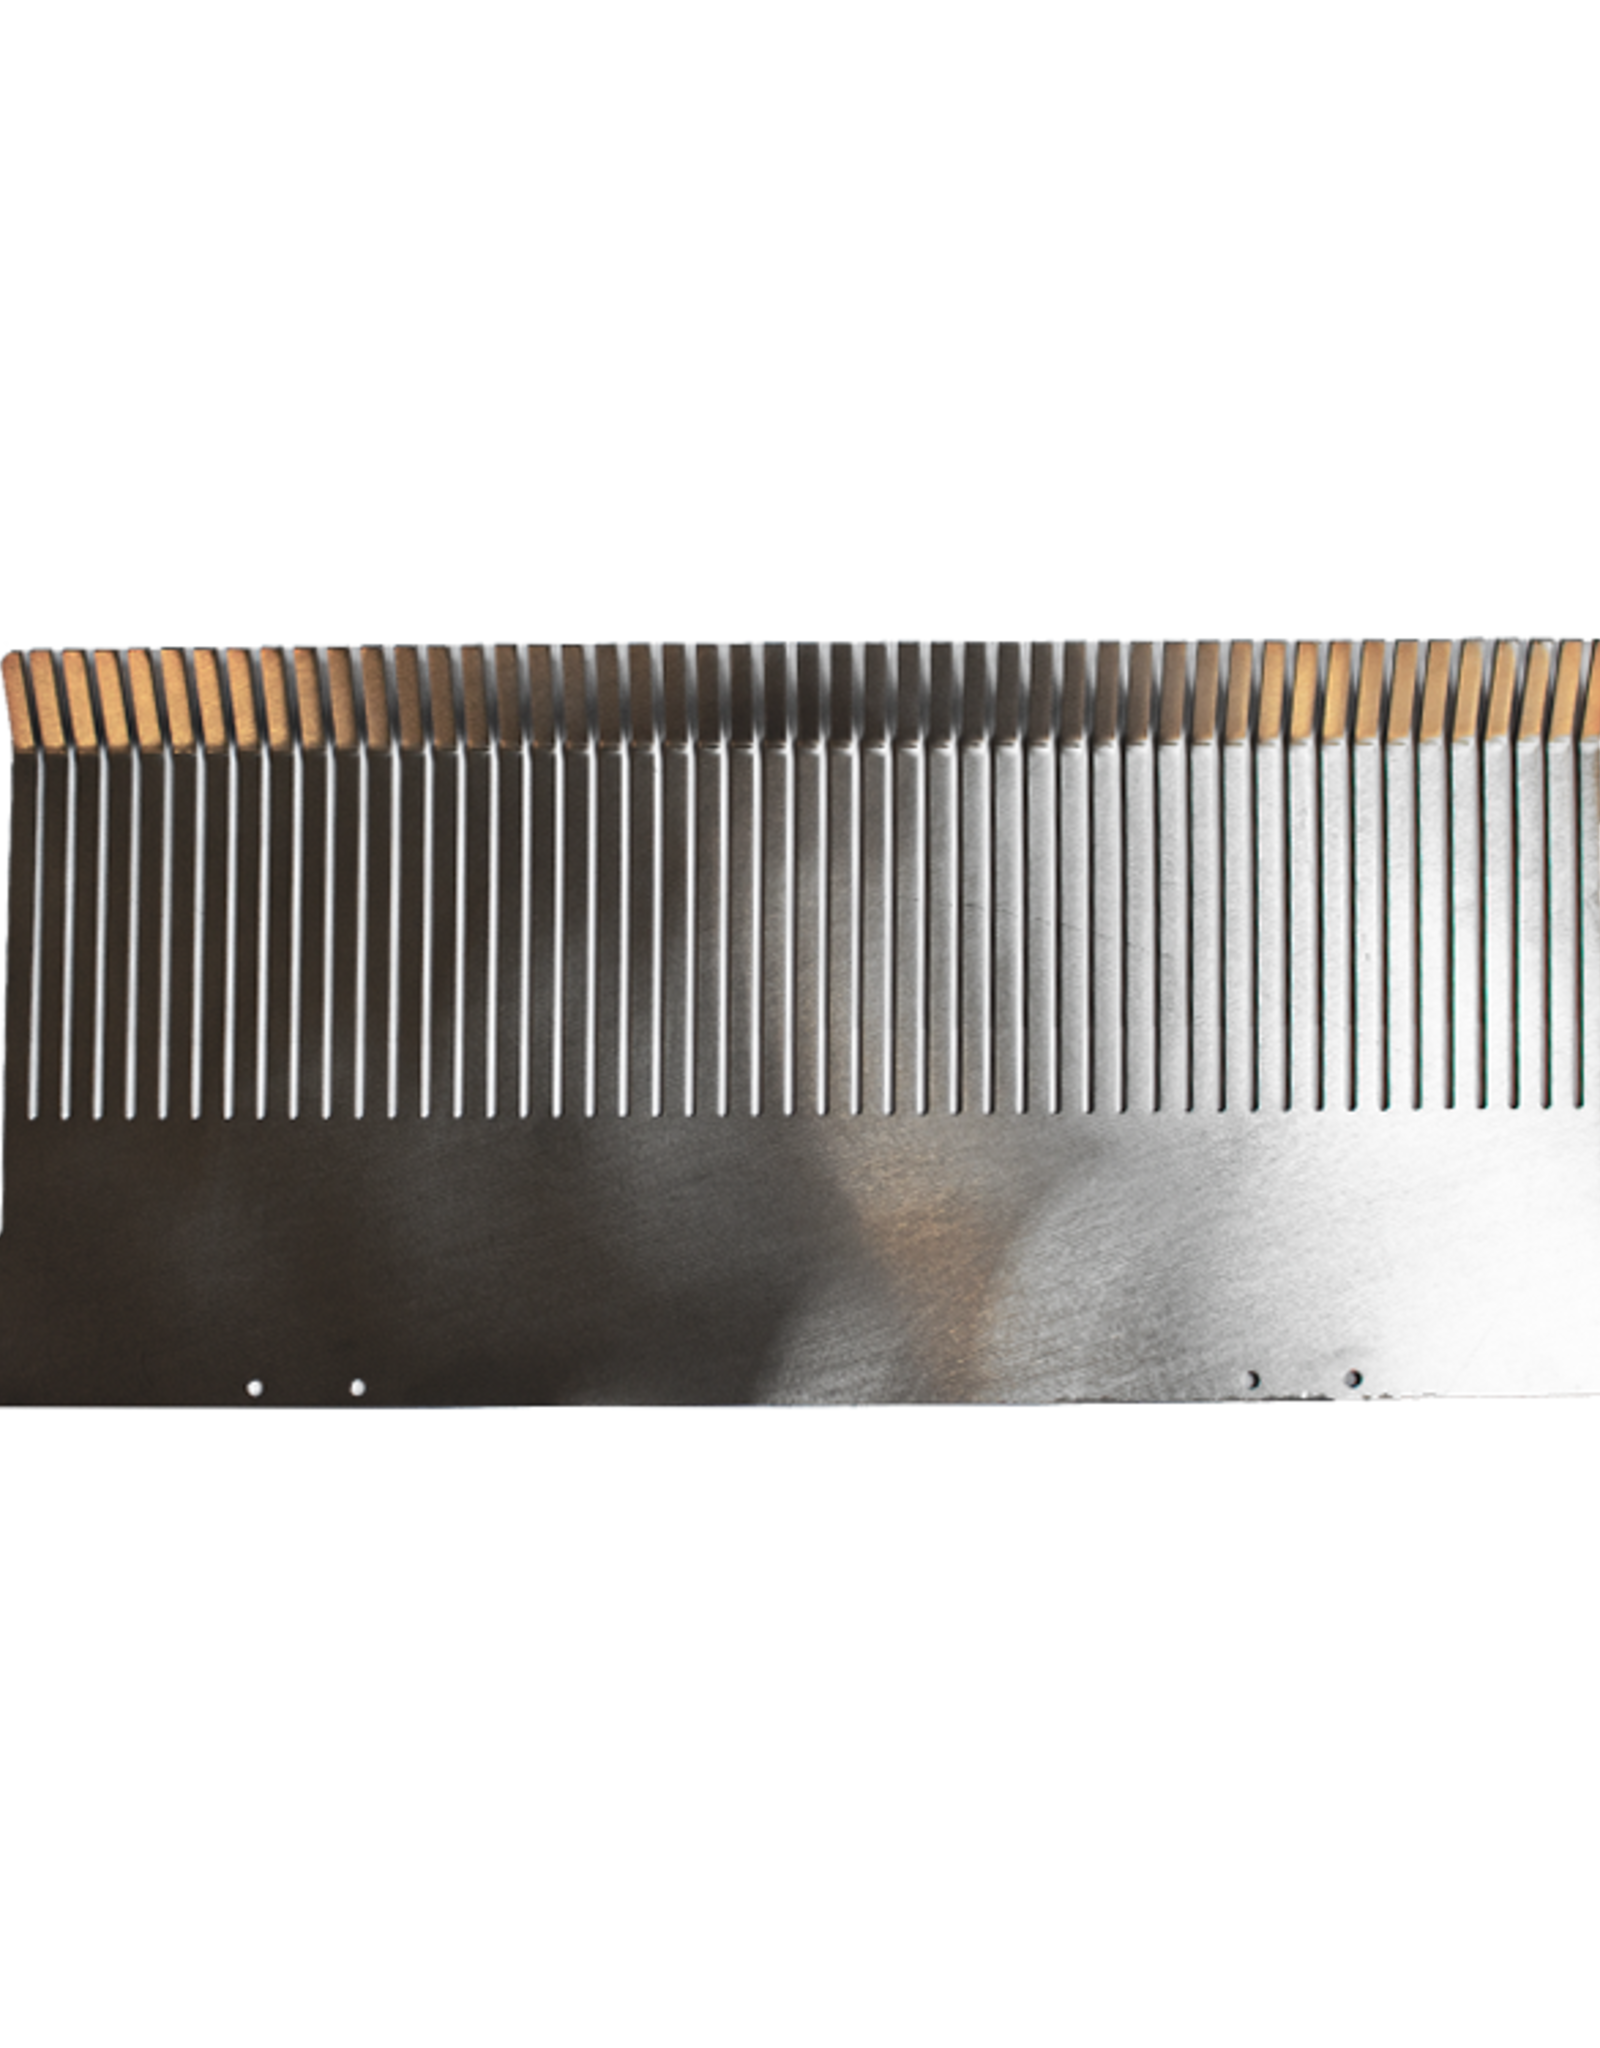 VLB Bread Slicers RVS drukplaat Eco-smart